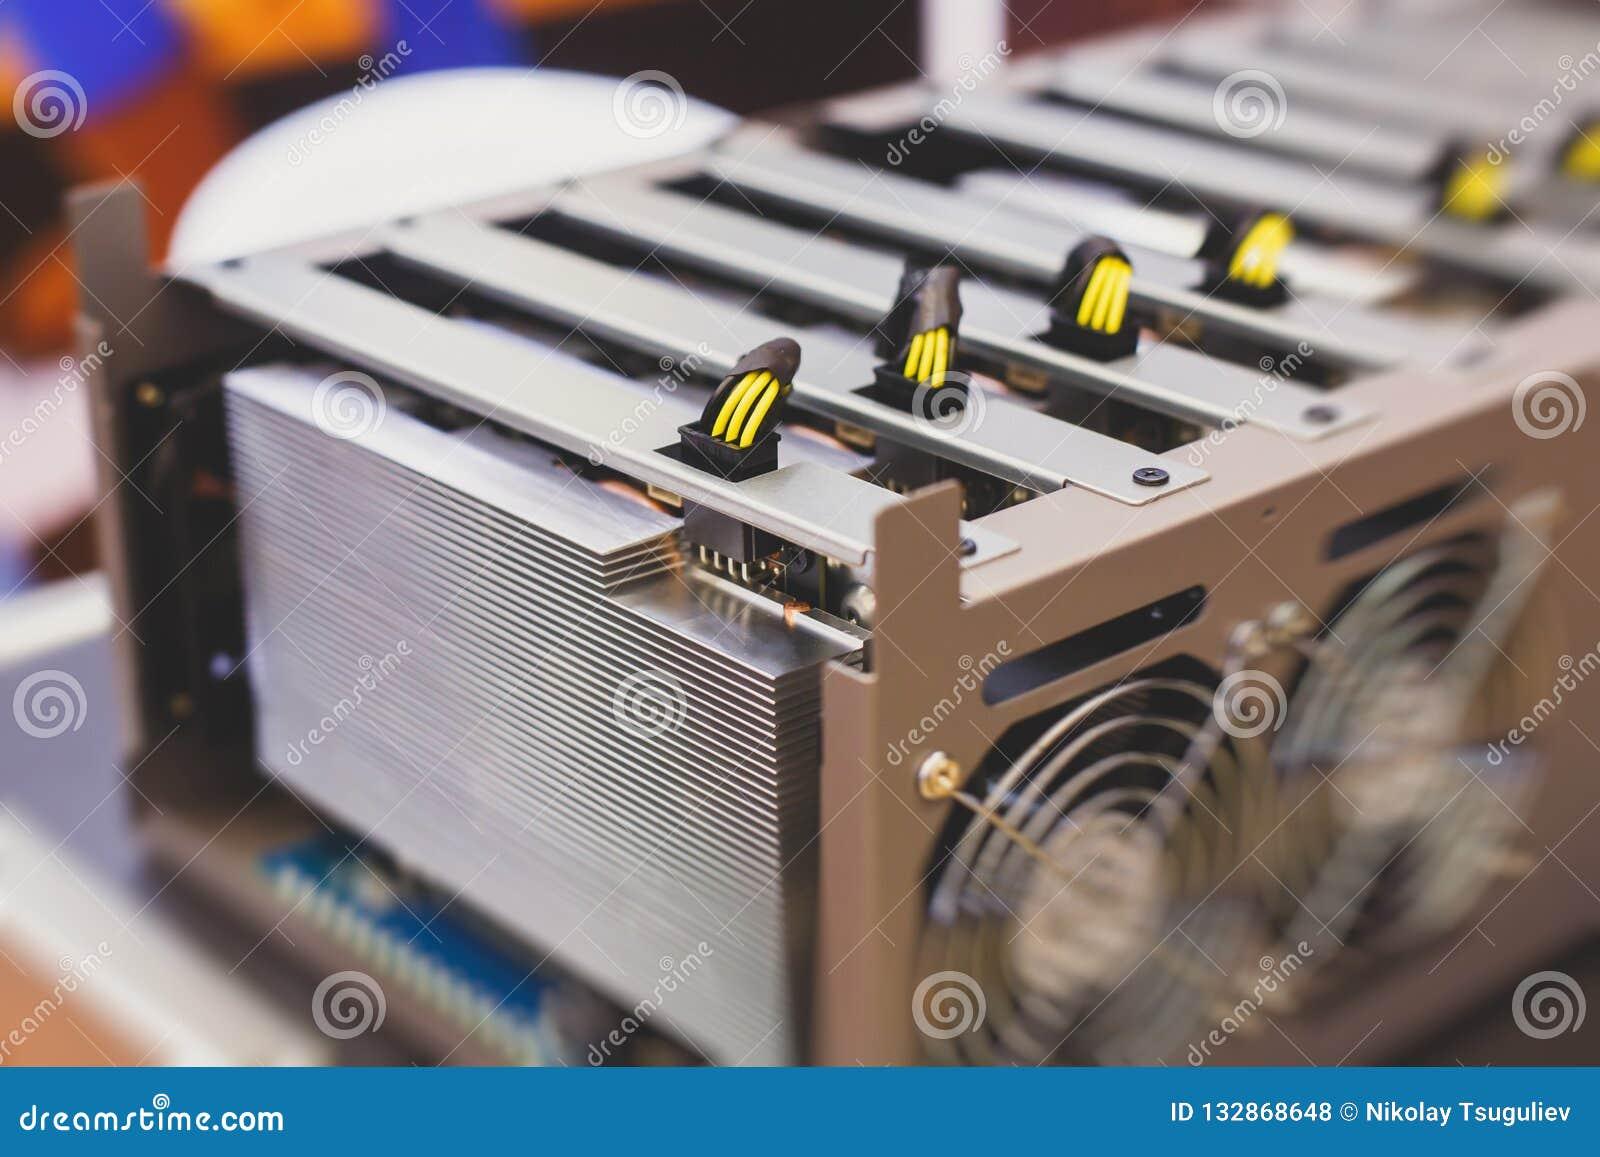 mining farm equipment